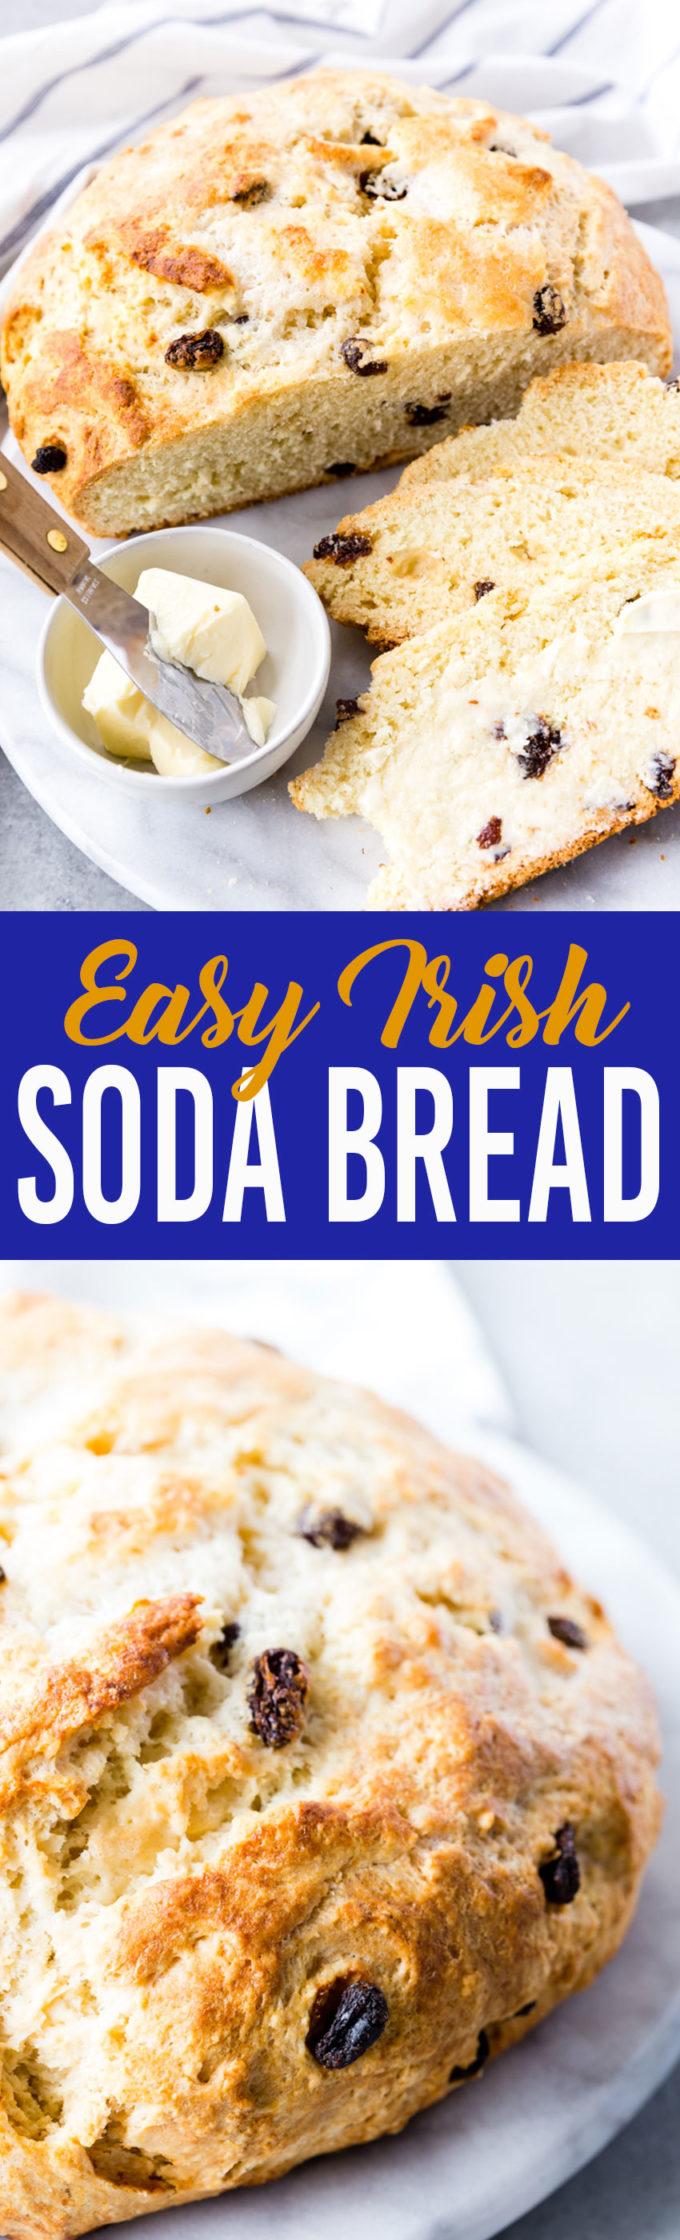 Easy Irish Soda Bread has a dense flavor, crisp crust, and so much flavor.